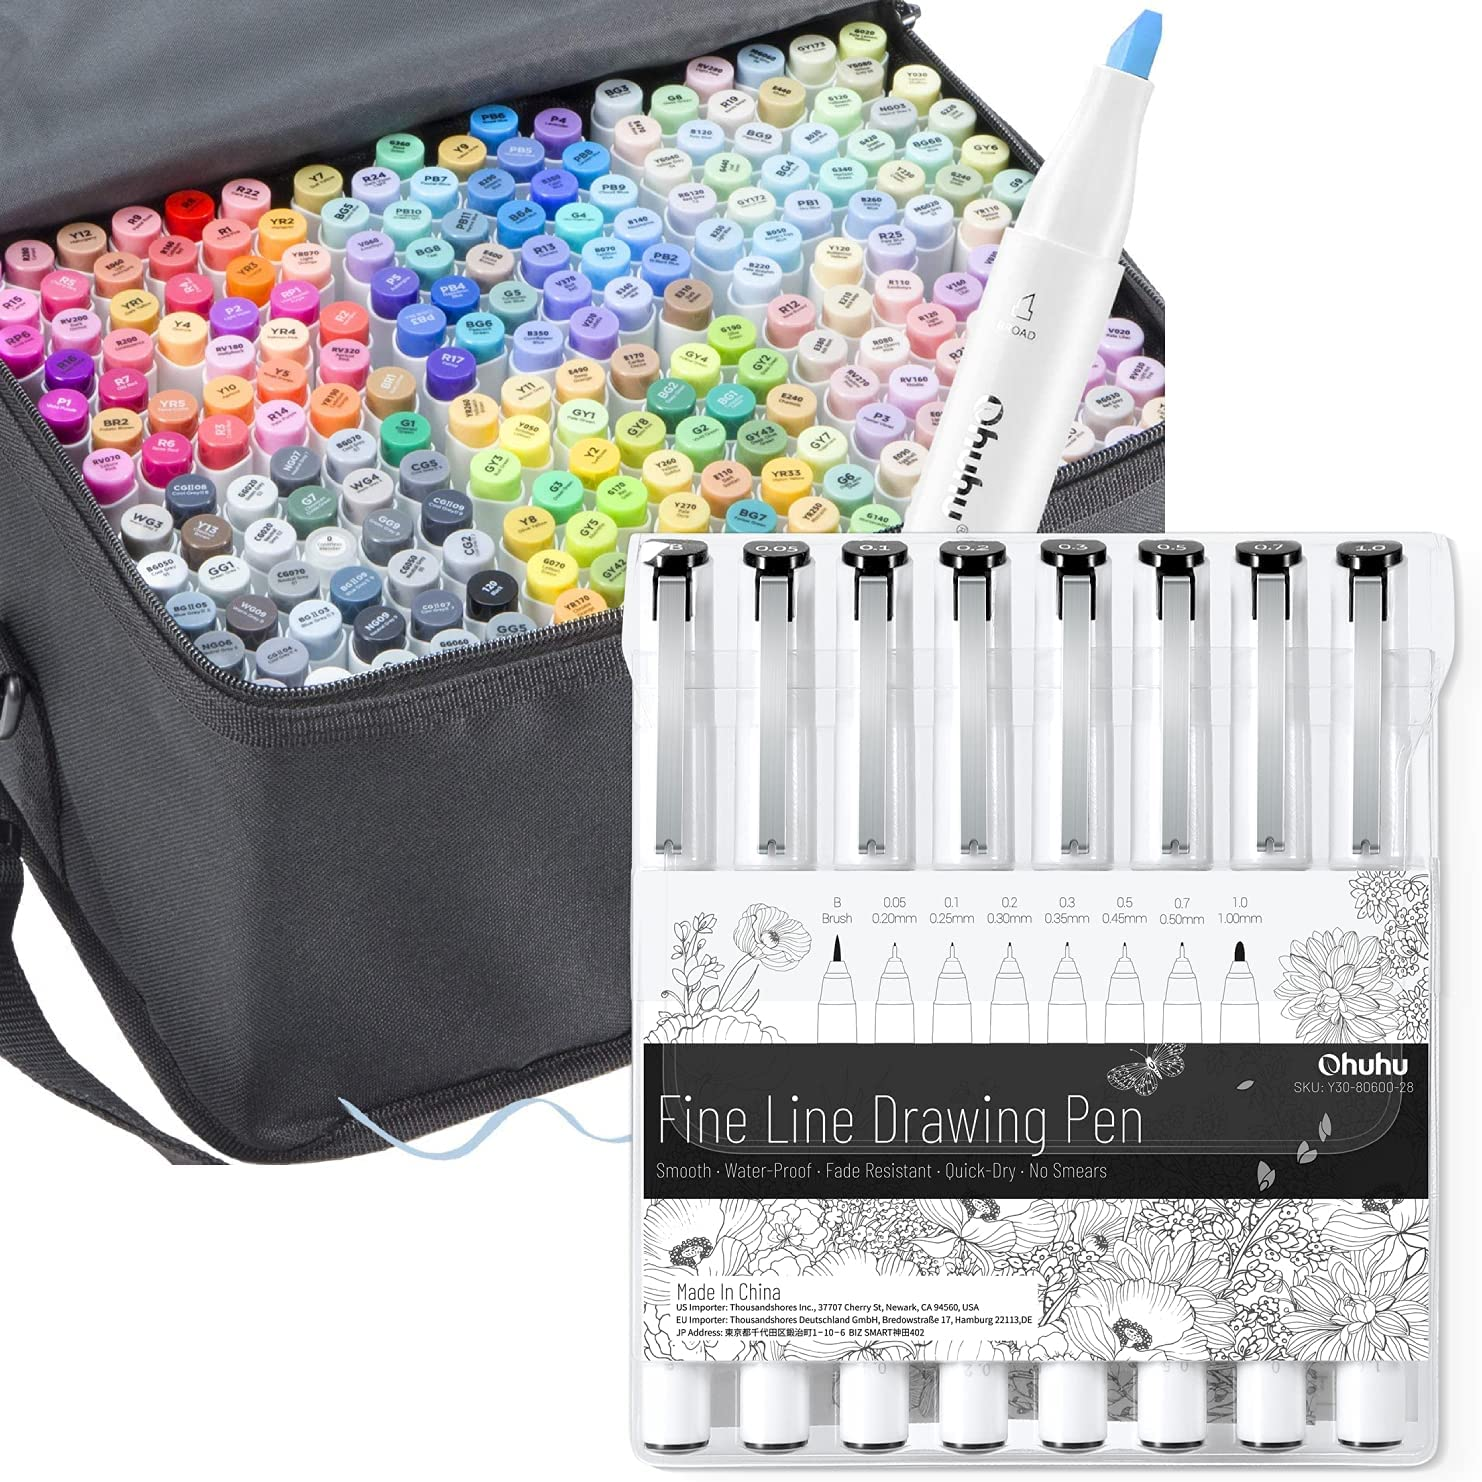 Ohuhu Alcohol Art Markers Set, 216-color Double Tipped Brush & Chisel Sketch Marker, Alcohol-based Brush Markers, Comes w/ 1 Blender + Fineliner Drawing Pen Set of 8 Pack Ultra Fine Line Drawing Marke